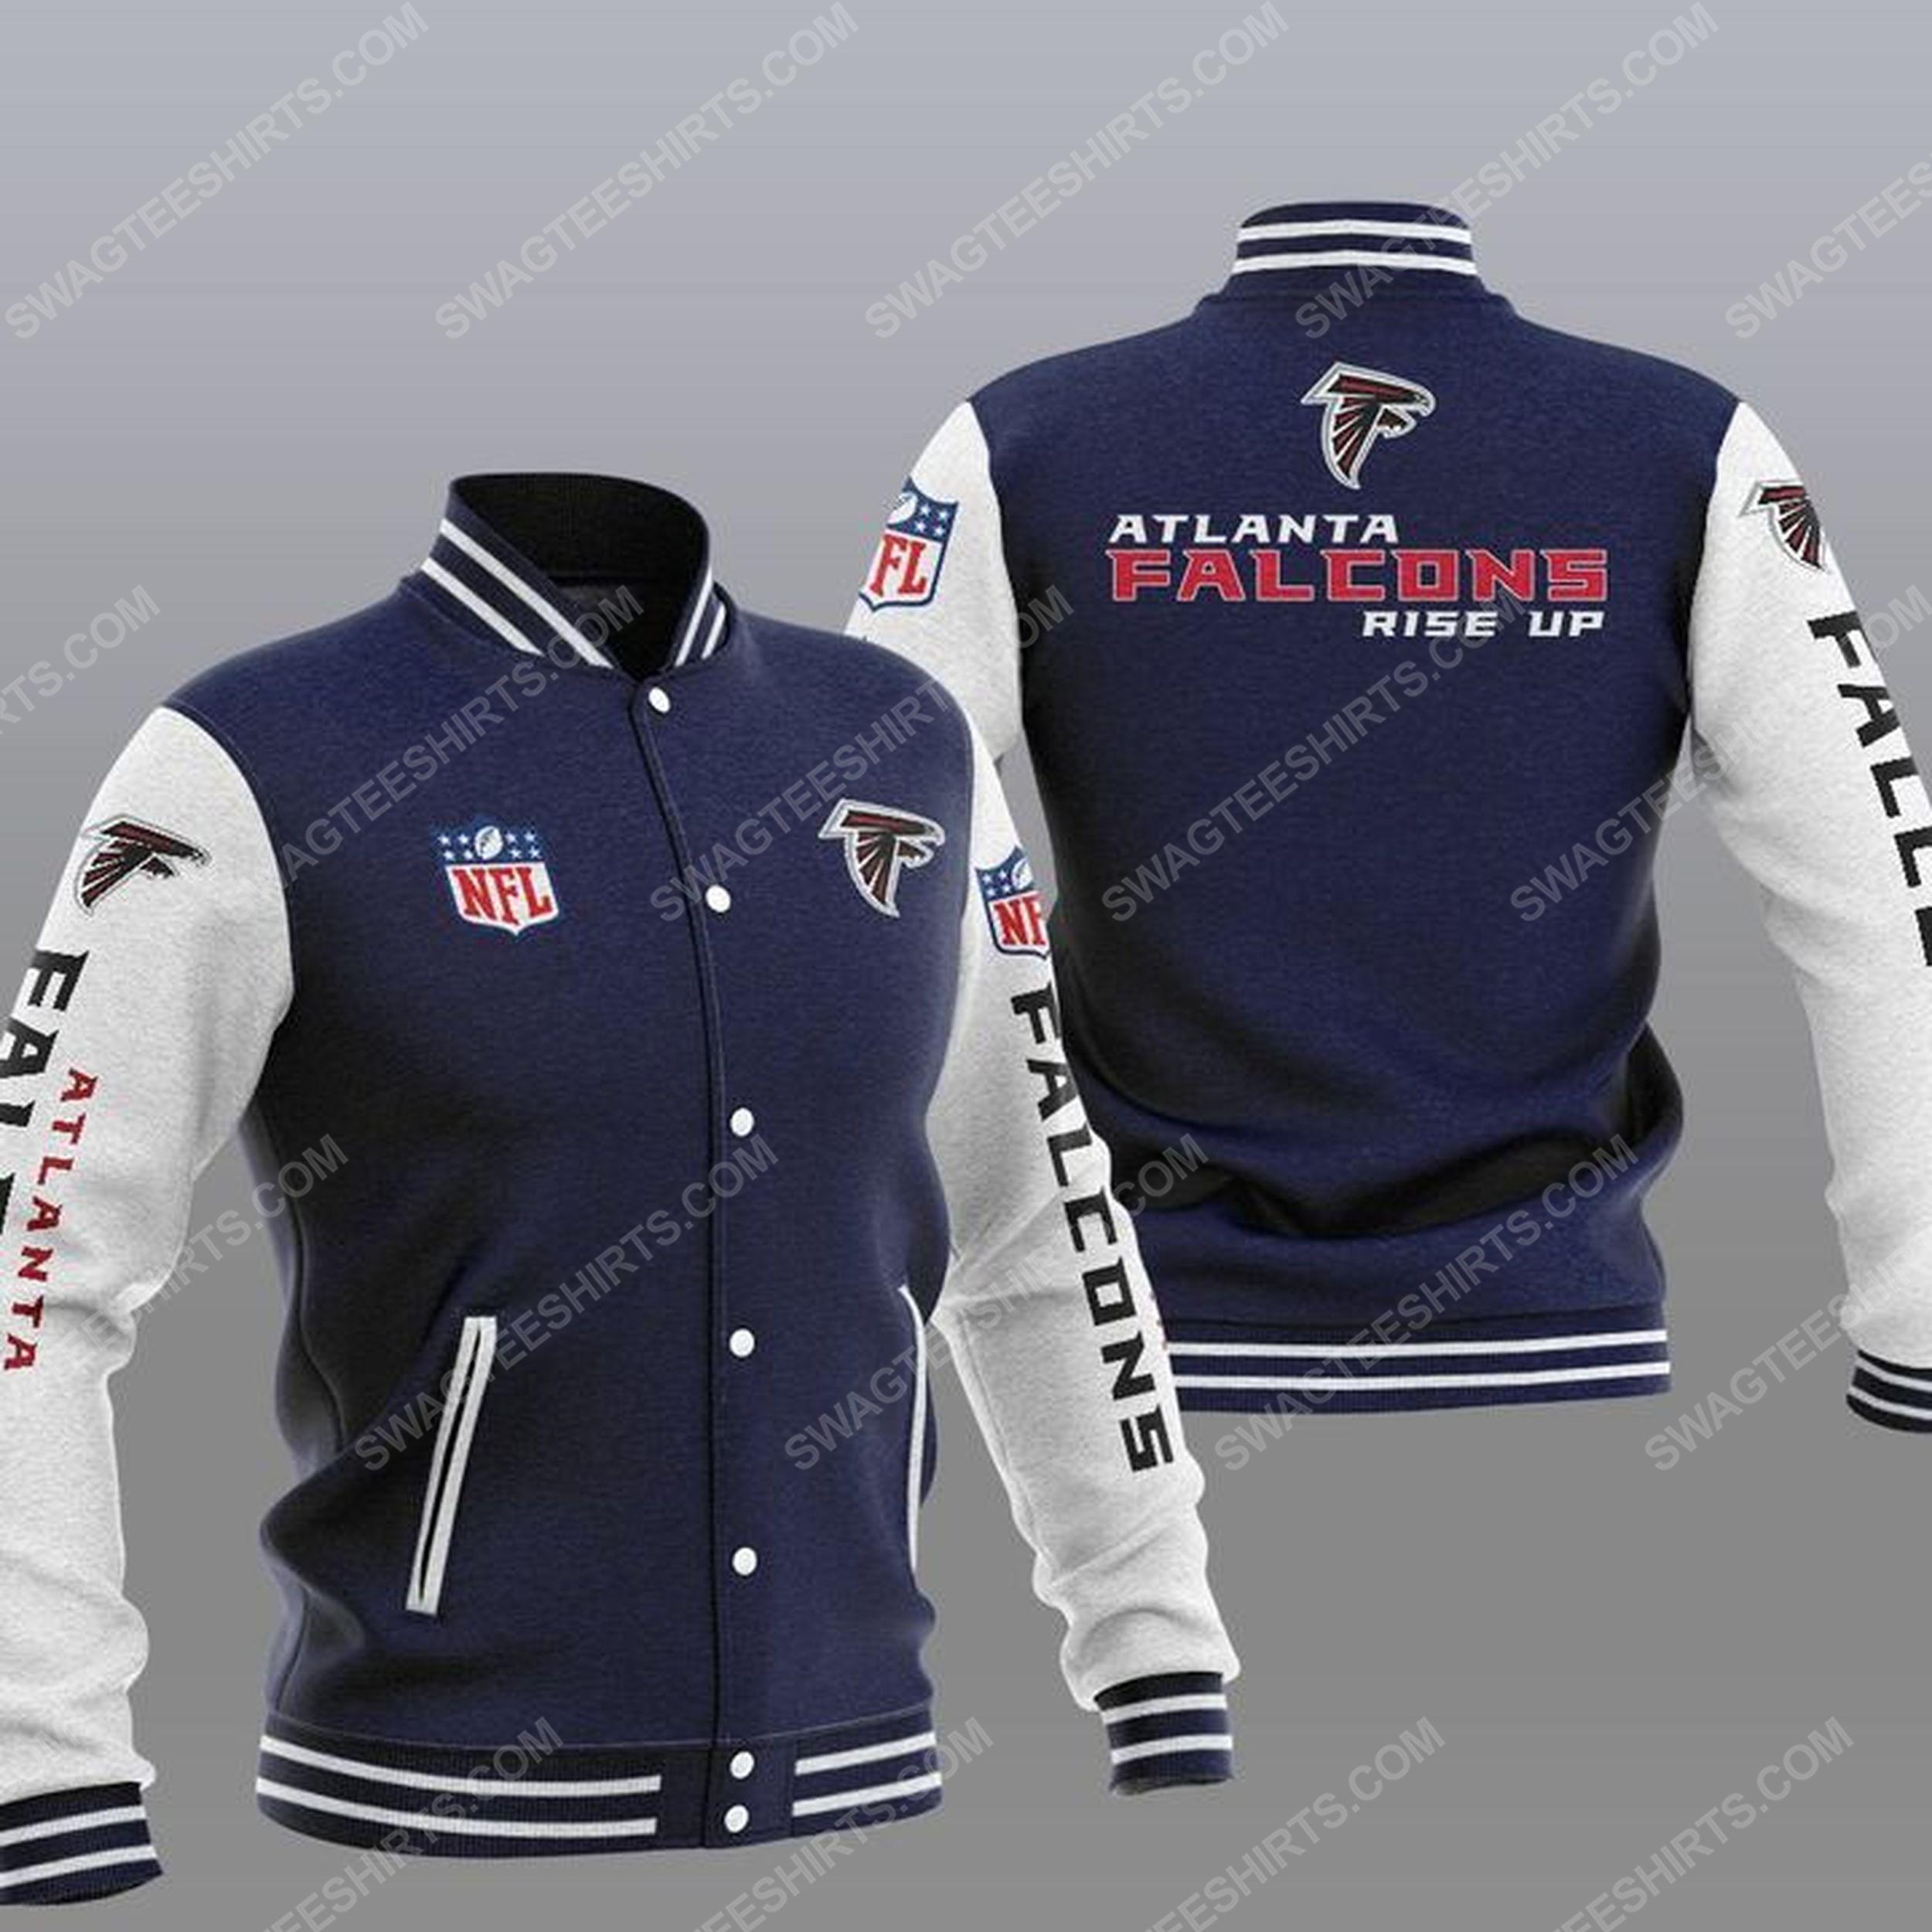 The atlanta falcons rise up all over print baseball jacket - navy 1